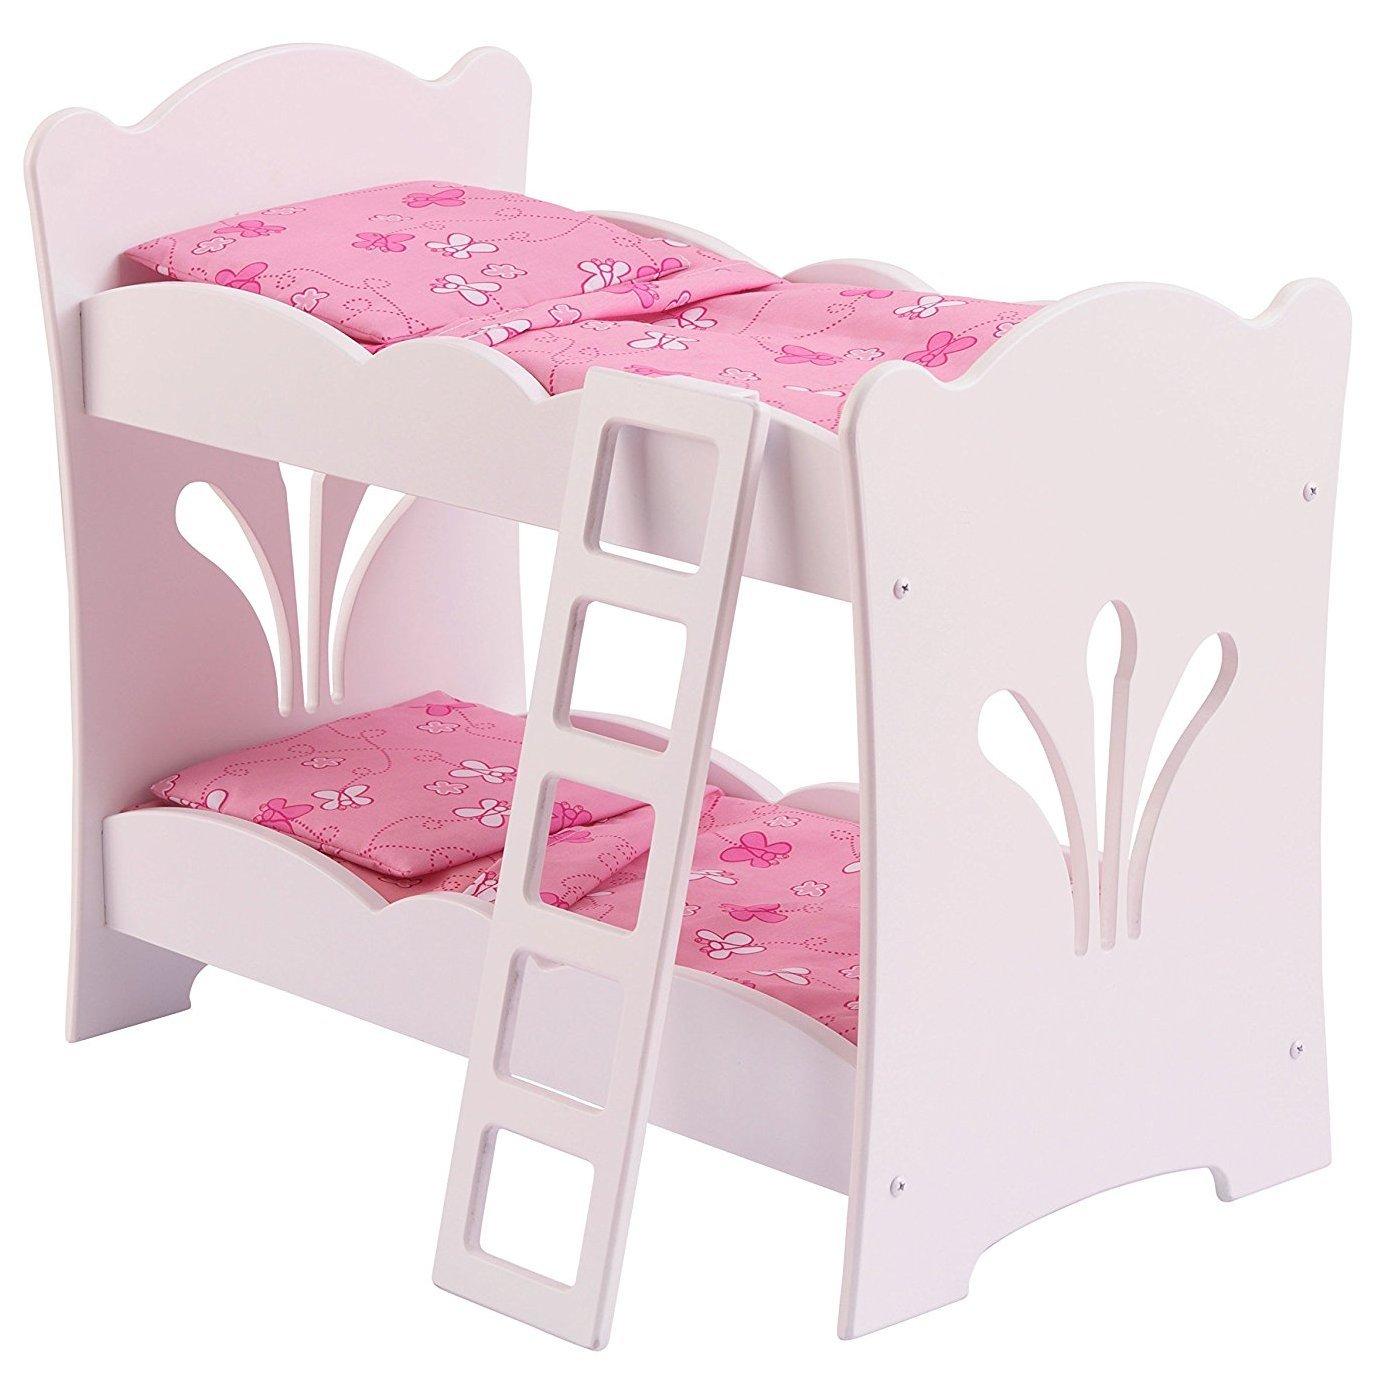 Двухъярусная кроватка - колыбель для куклыДетские кроватки для кукол<br>Двухъярусная кроватка - колыбель для куклы<br>